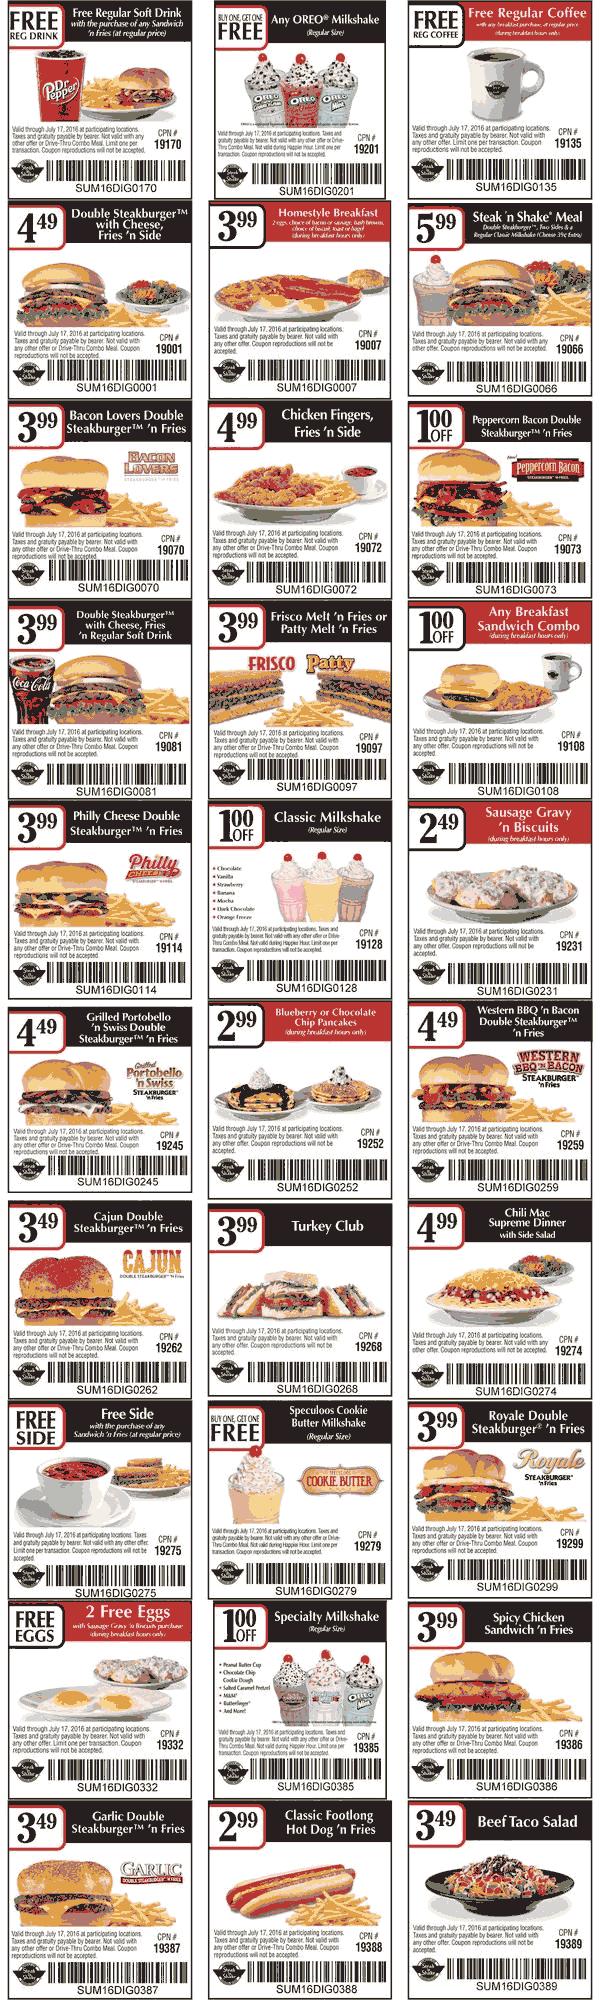 Various Meal Coupons For Steak N Shake Restaurants Steak N Shake Coupons Shakes Coupon Apps